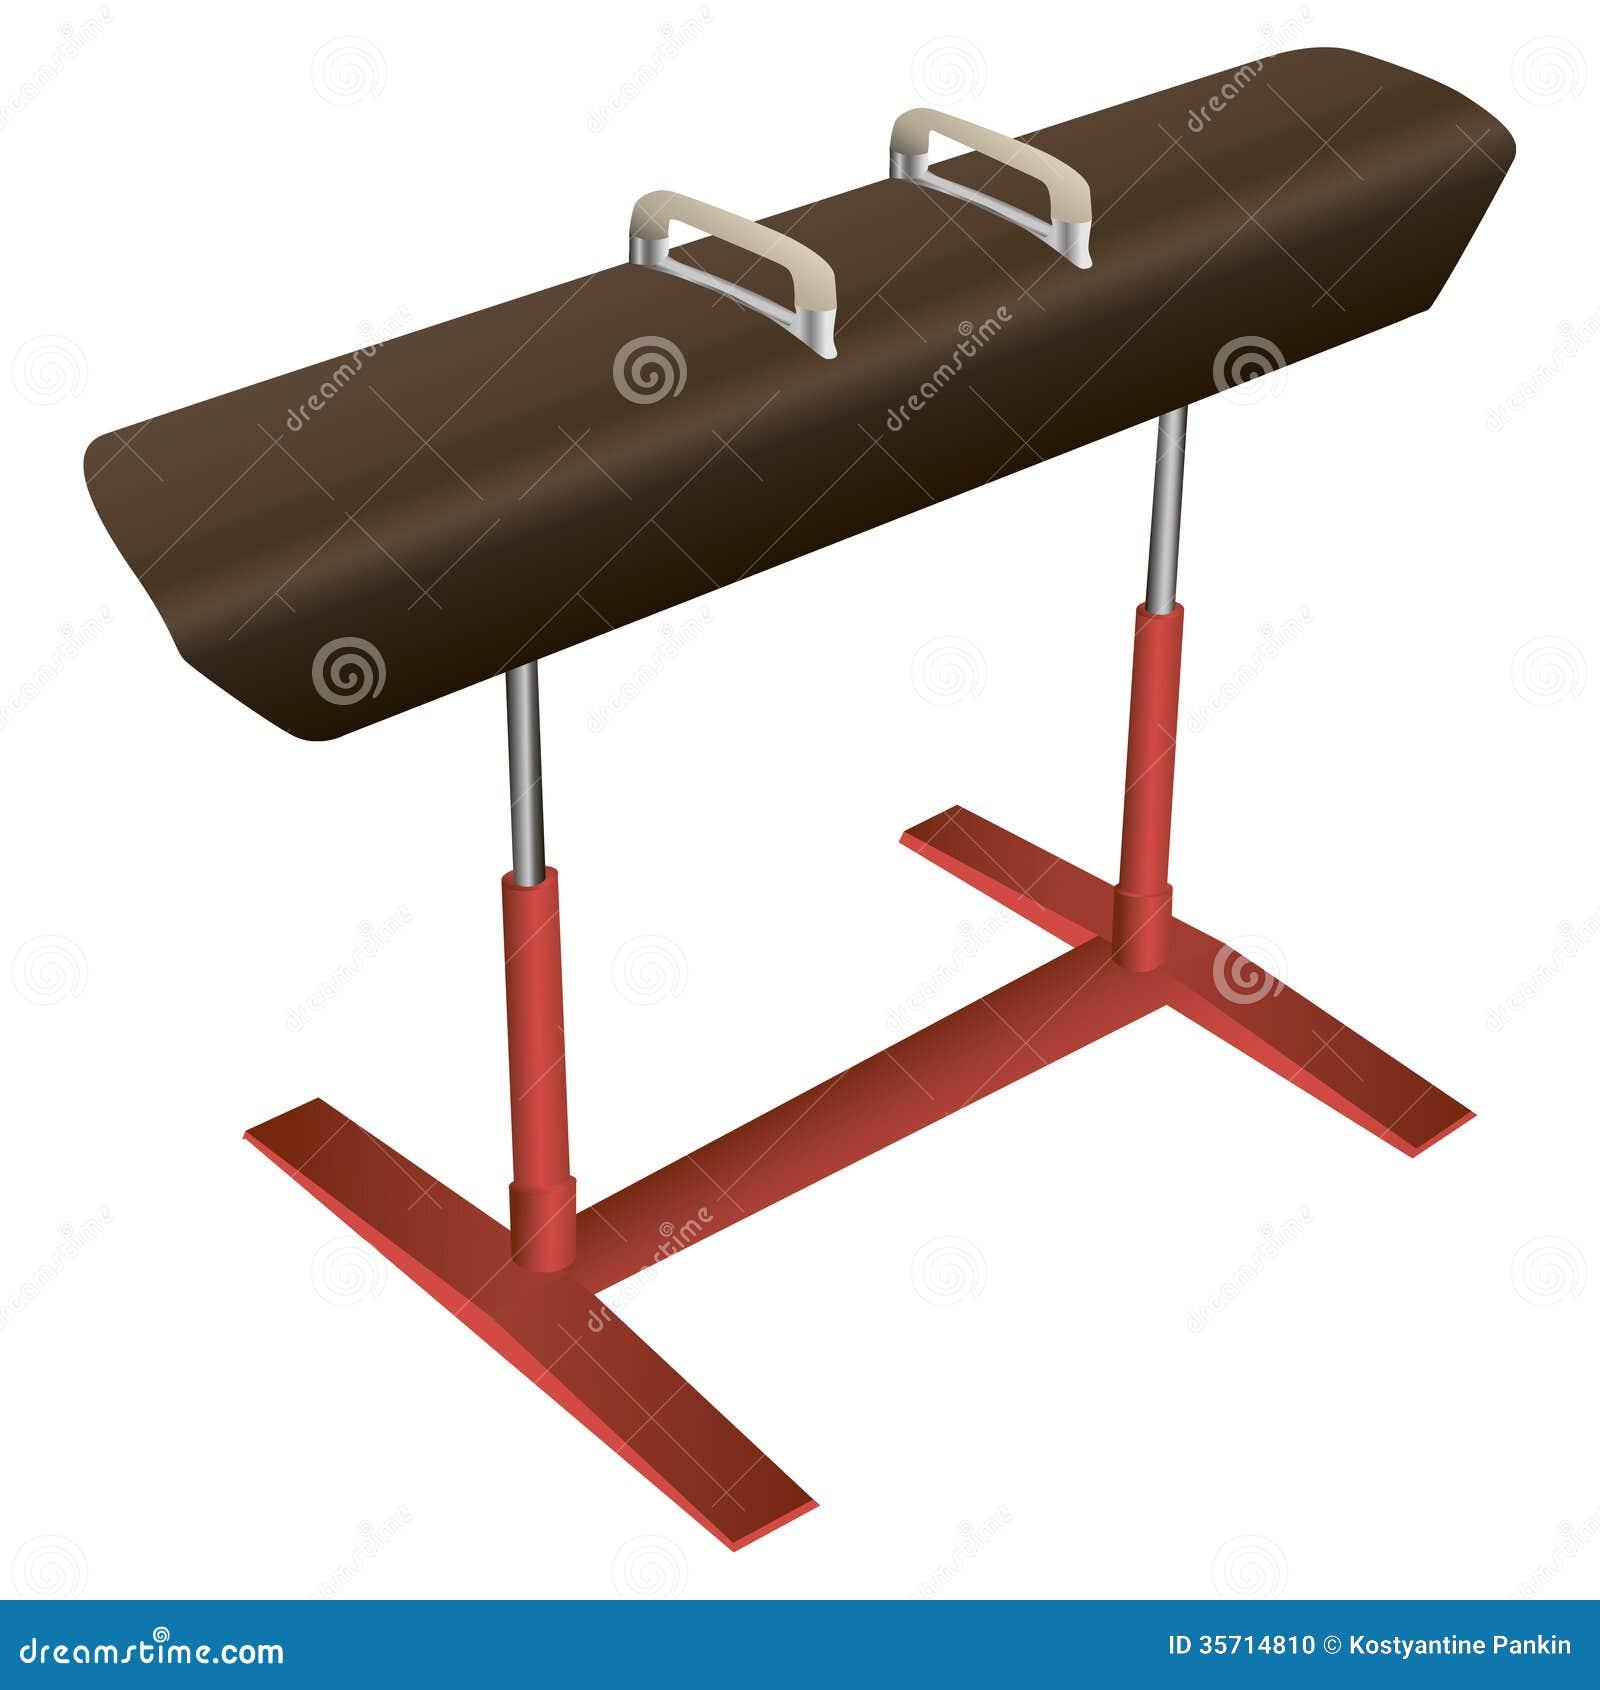 Athletics Gymnastics Strength: Vaulting Horse Stock Vector. Image Of Strength, Gymnastics